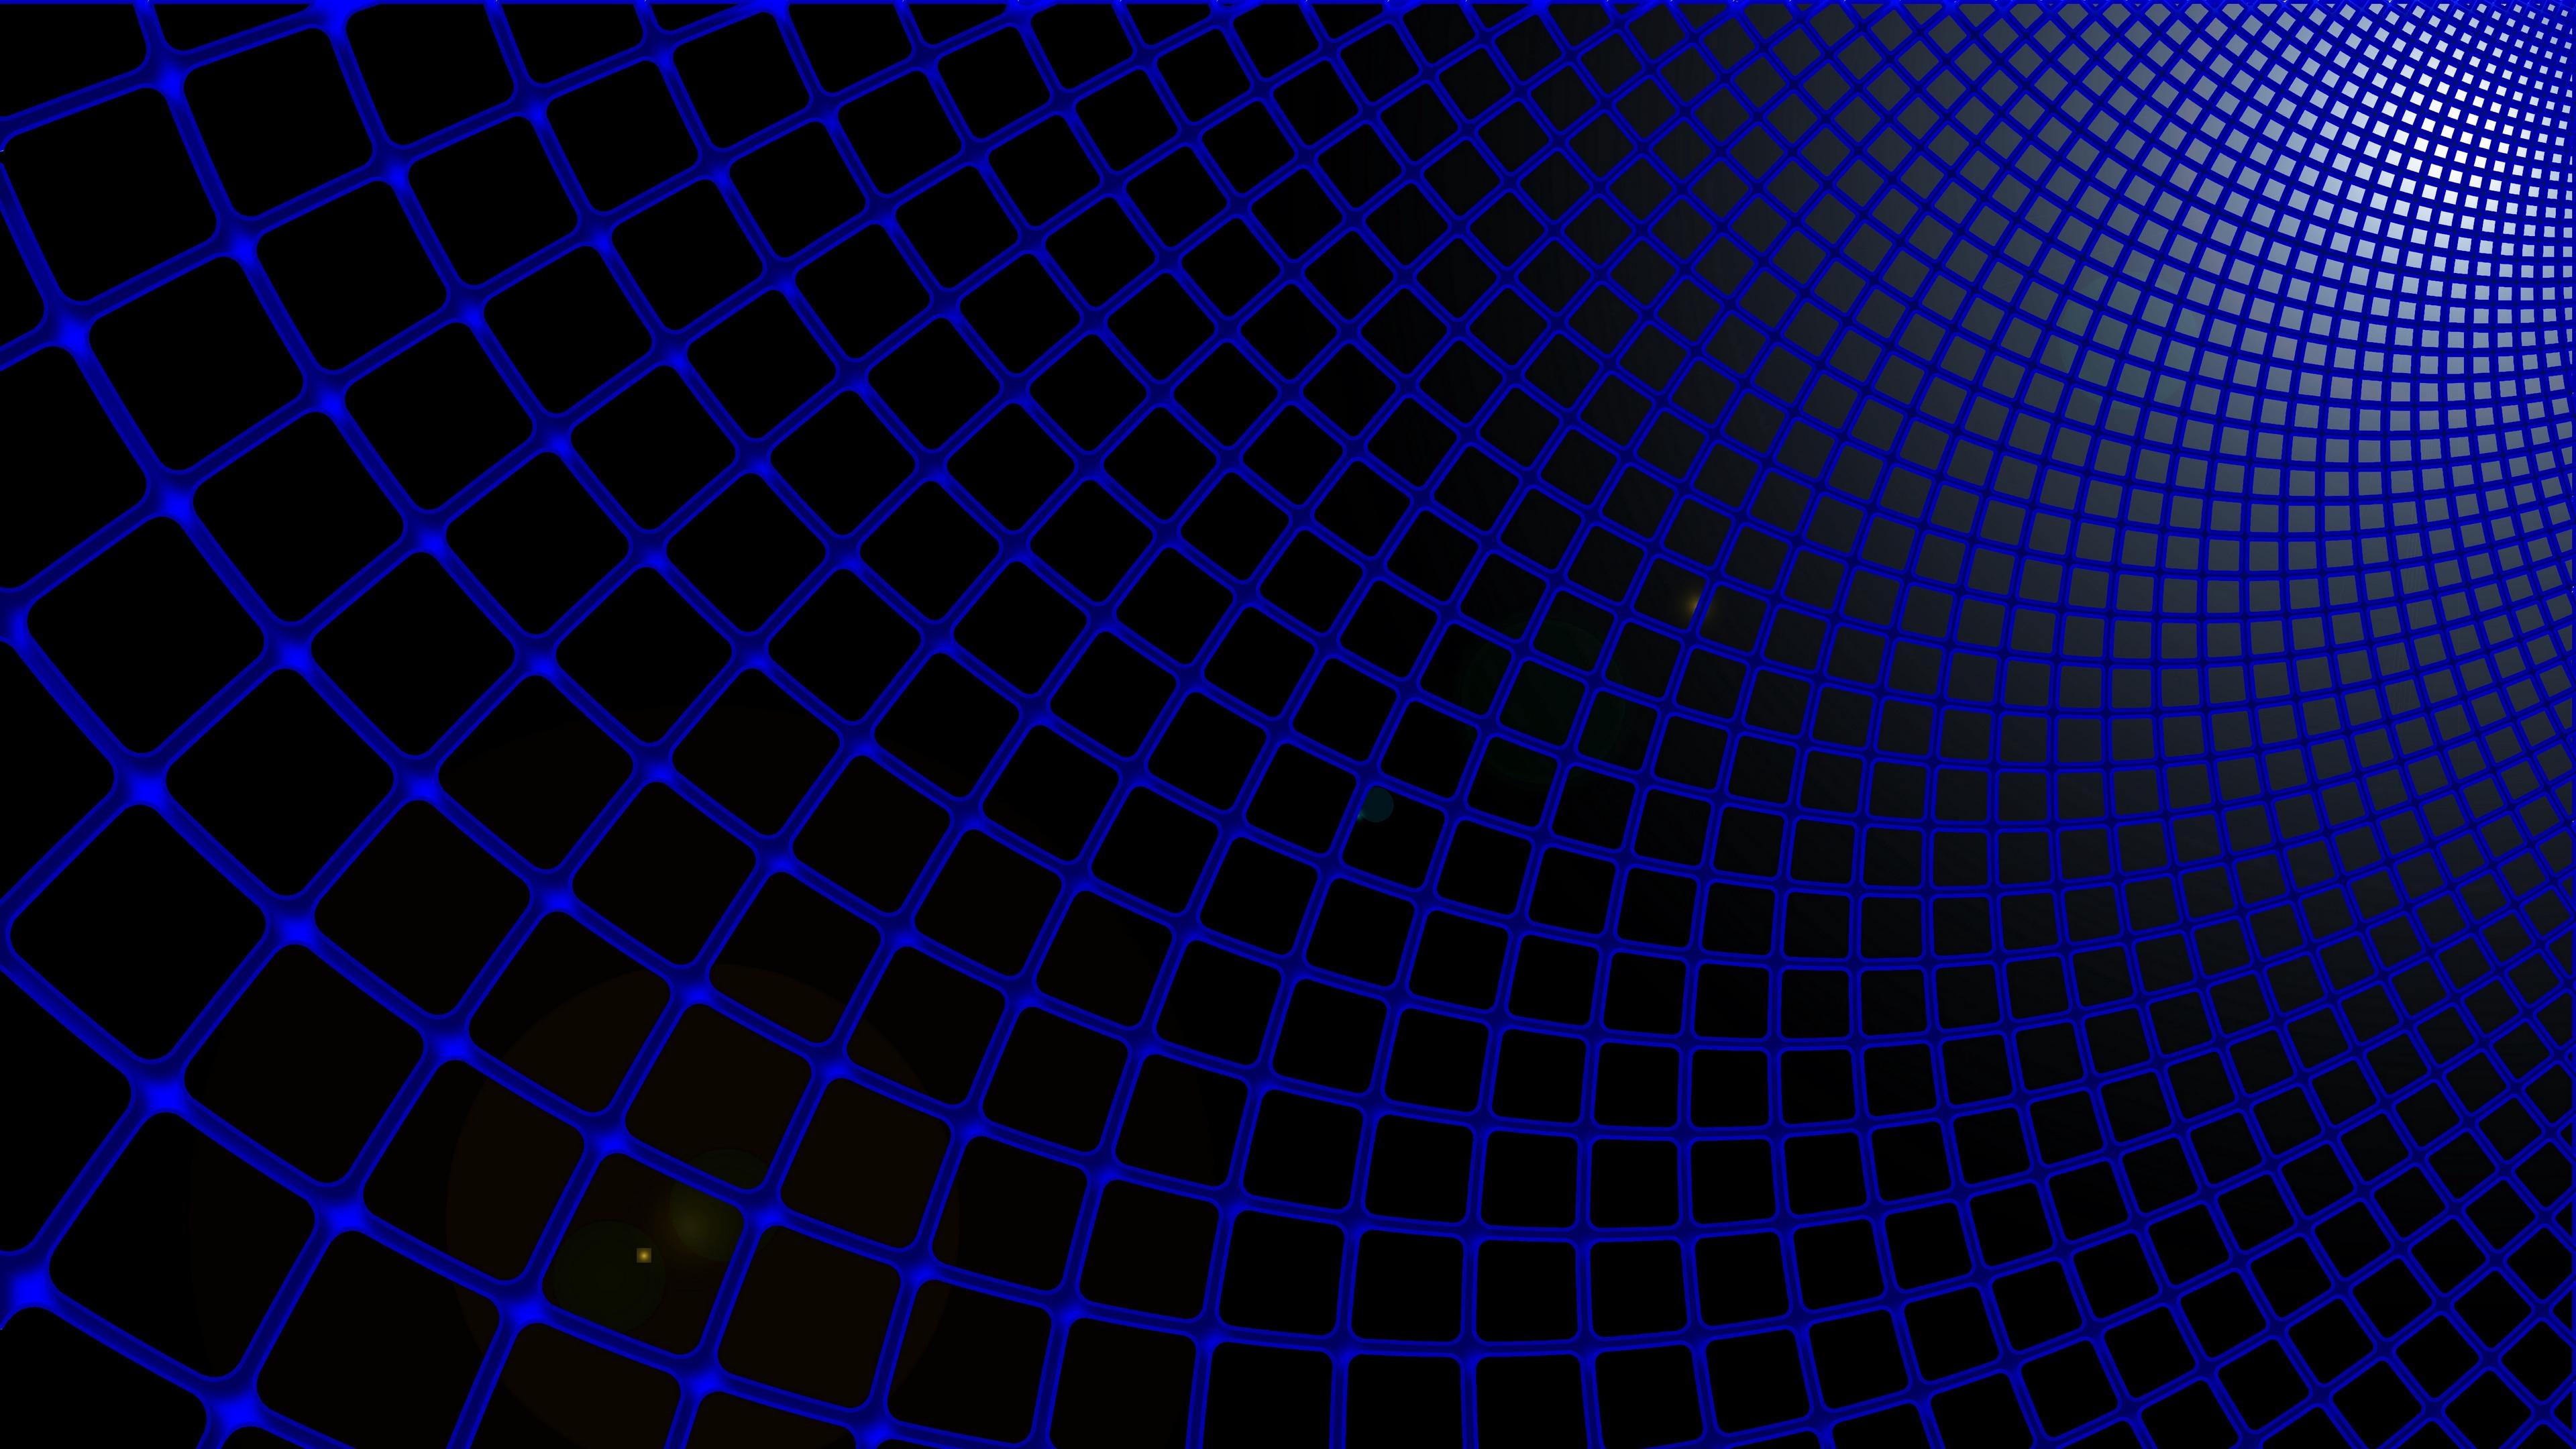 grid blue black futuristic 4k 1536097857 - grid, blue, black, futuristic 4k - Grid, blue, Black